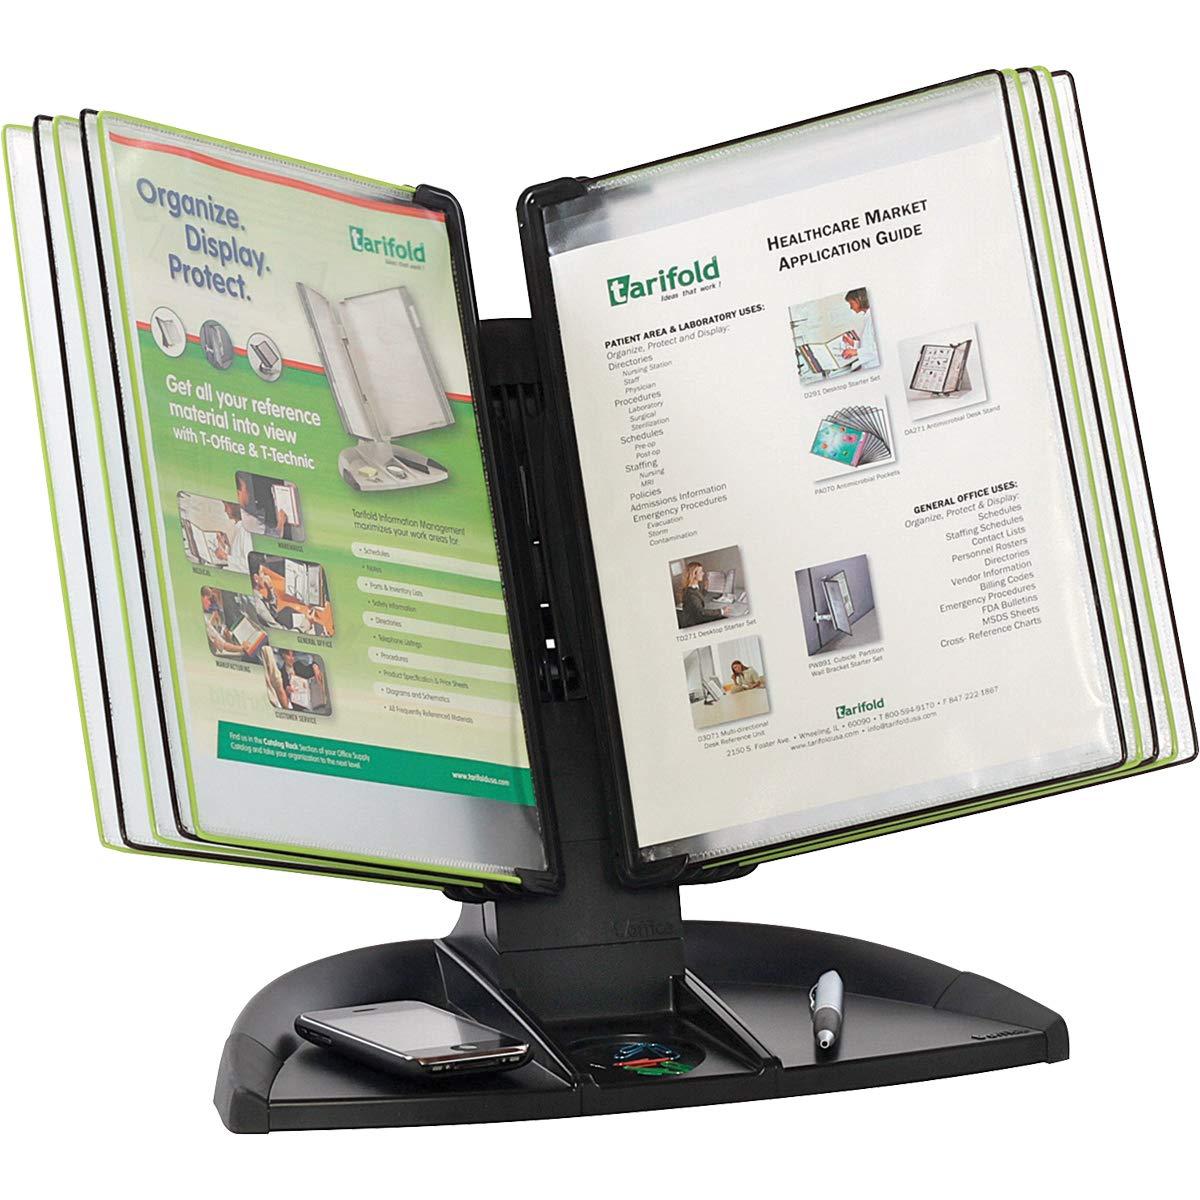 Tarifold Desktop Reference System With Built-in Desk Organizer, 10 Display Pockets, Black Base (TDBL291) by Tarifold